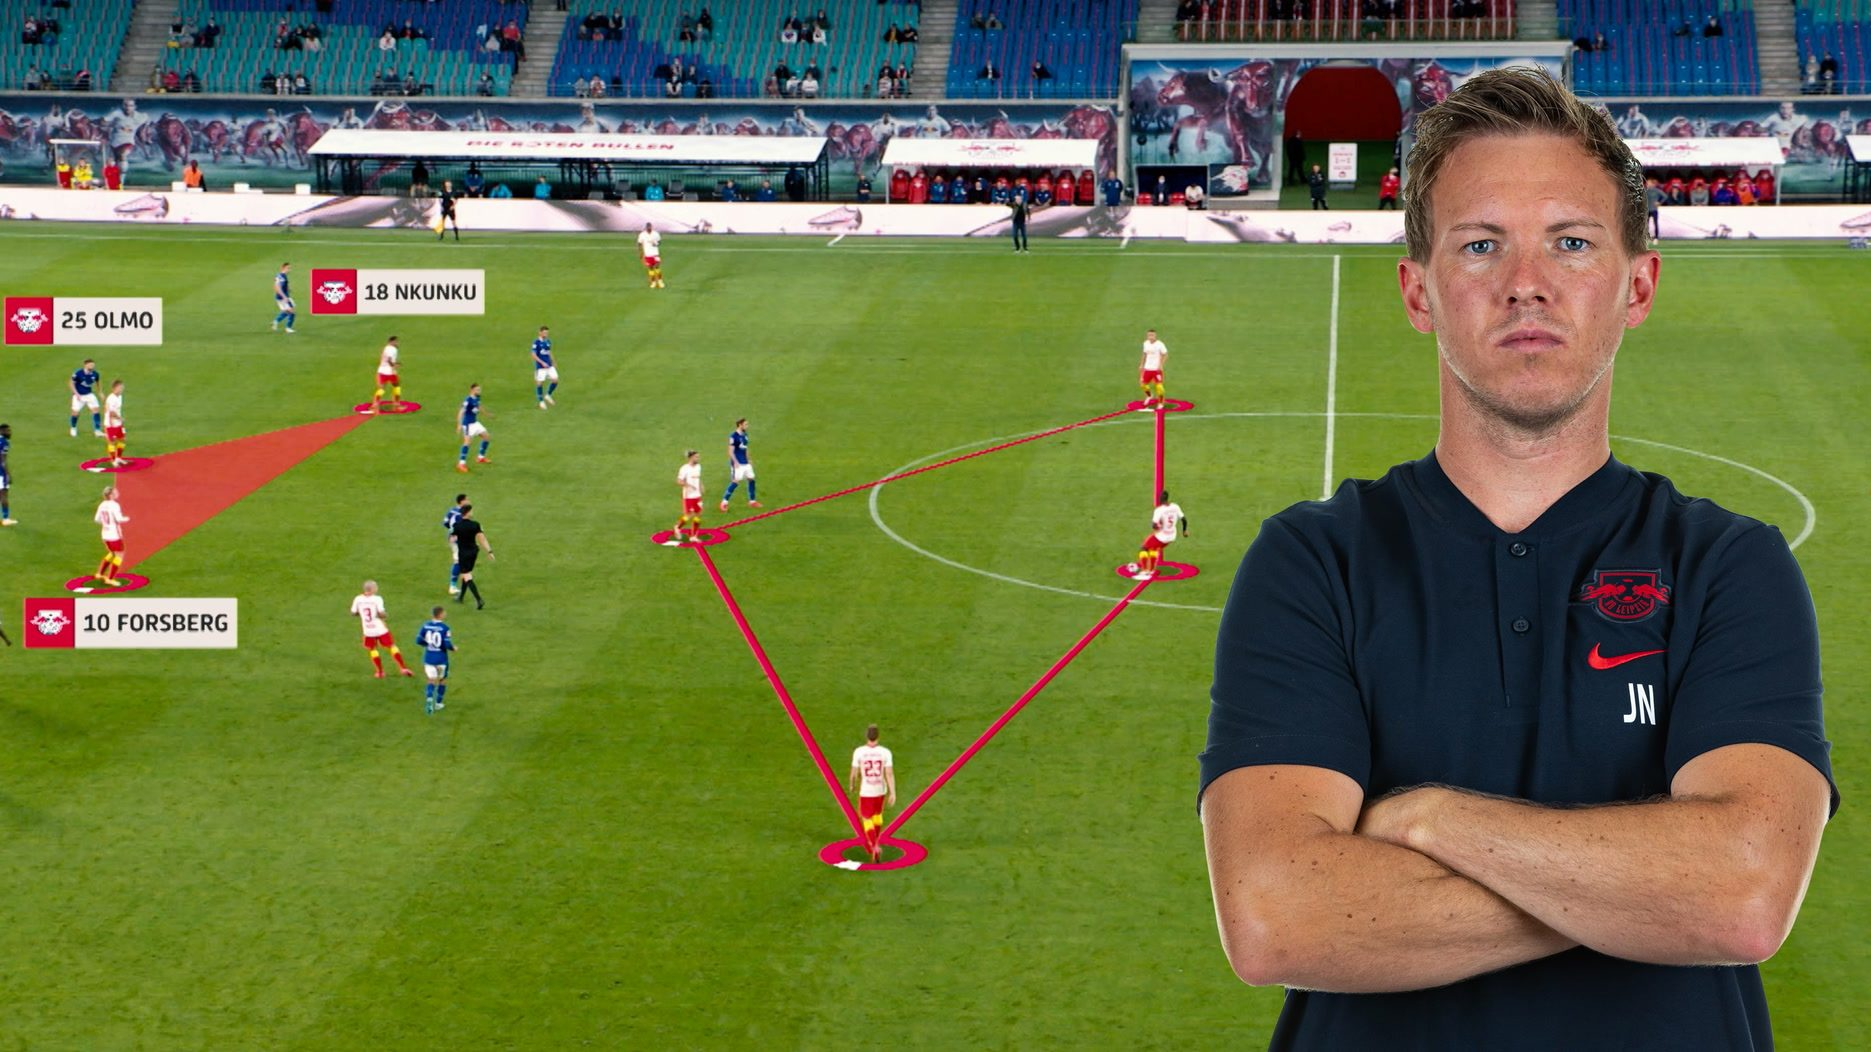 Bundesliga | Dominik Szoboszlai: 5 things on RB Leipzig's new attacking midfielder